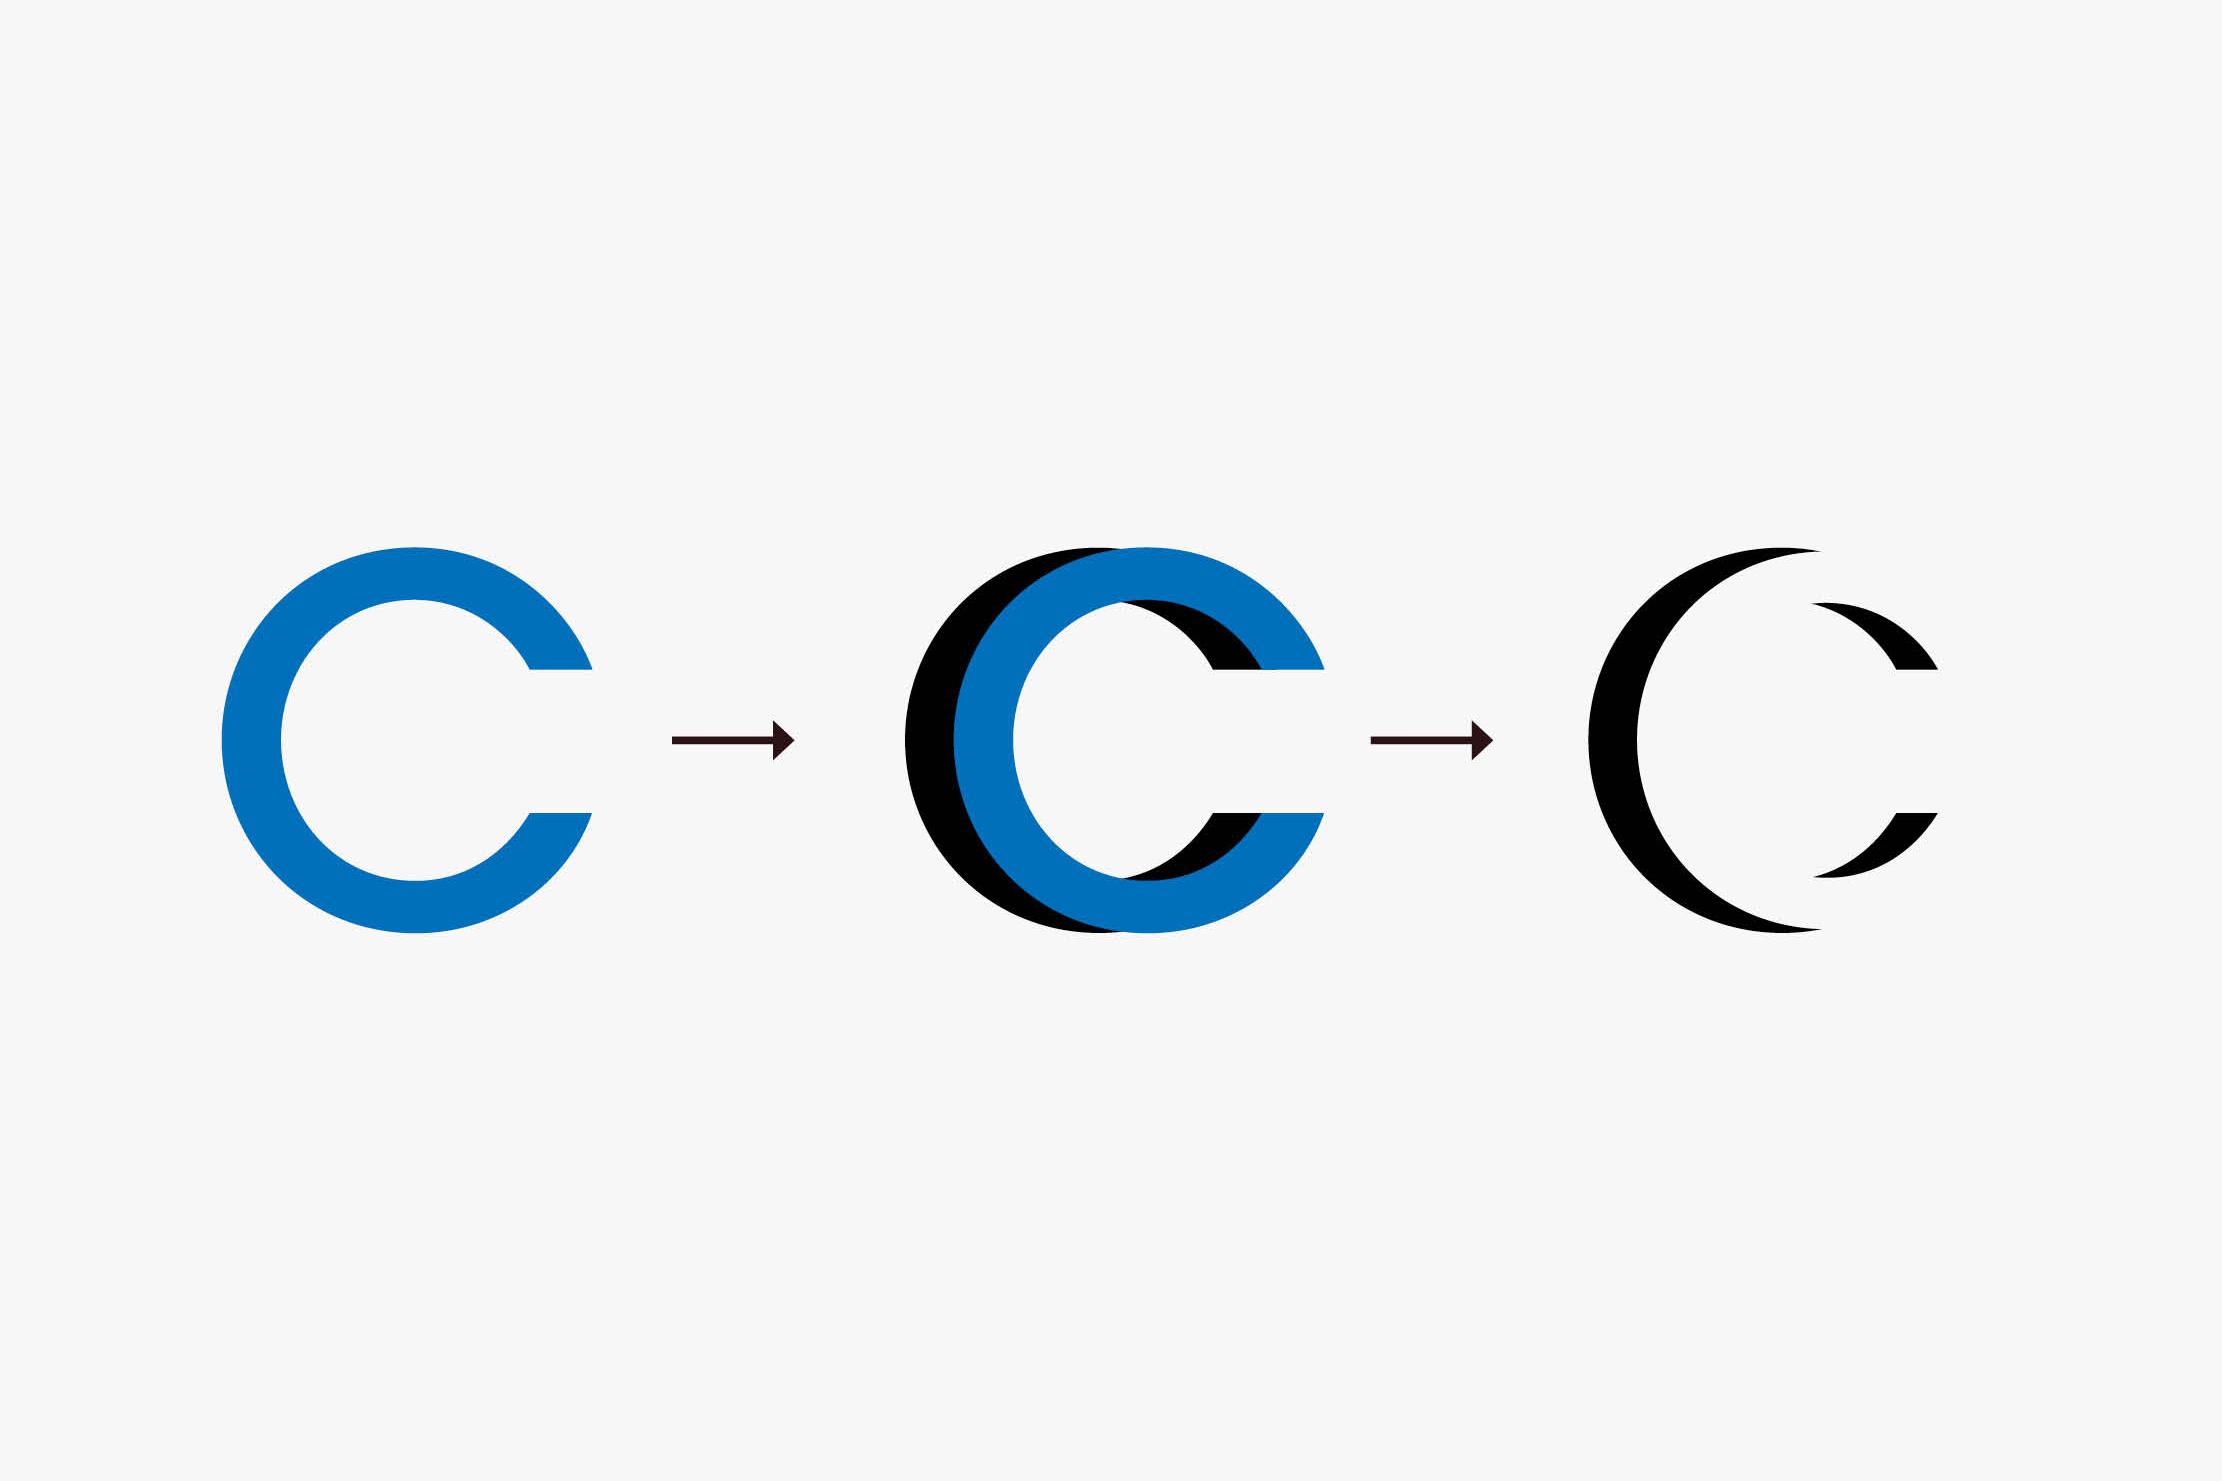 Carla-logo-rationale-Daniel-Cavalcanti